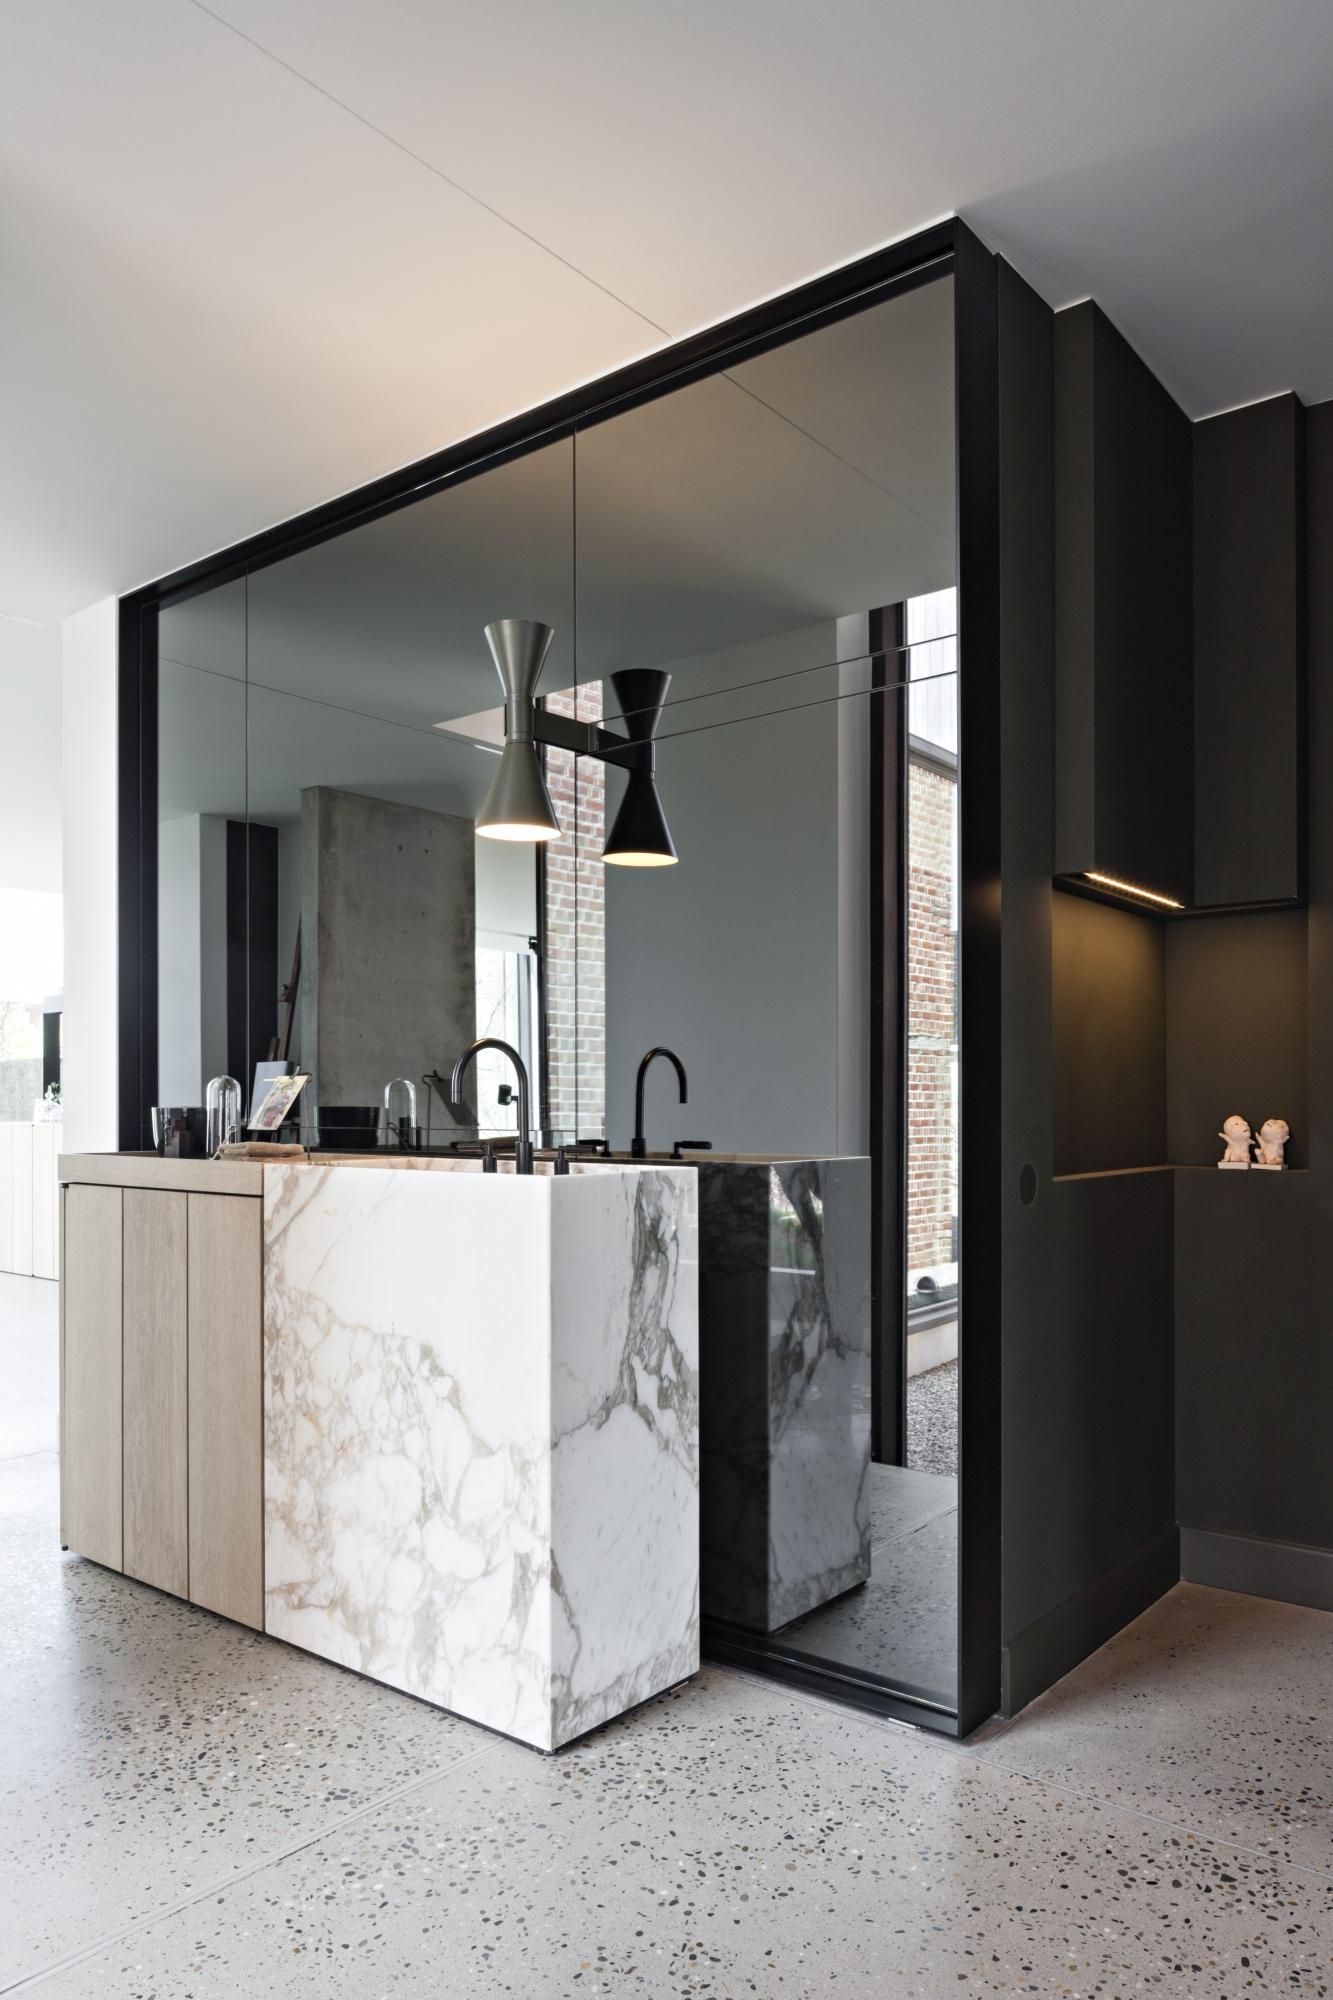 Mirrored Walls: Head to Toe